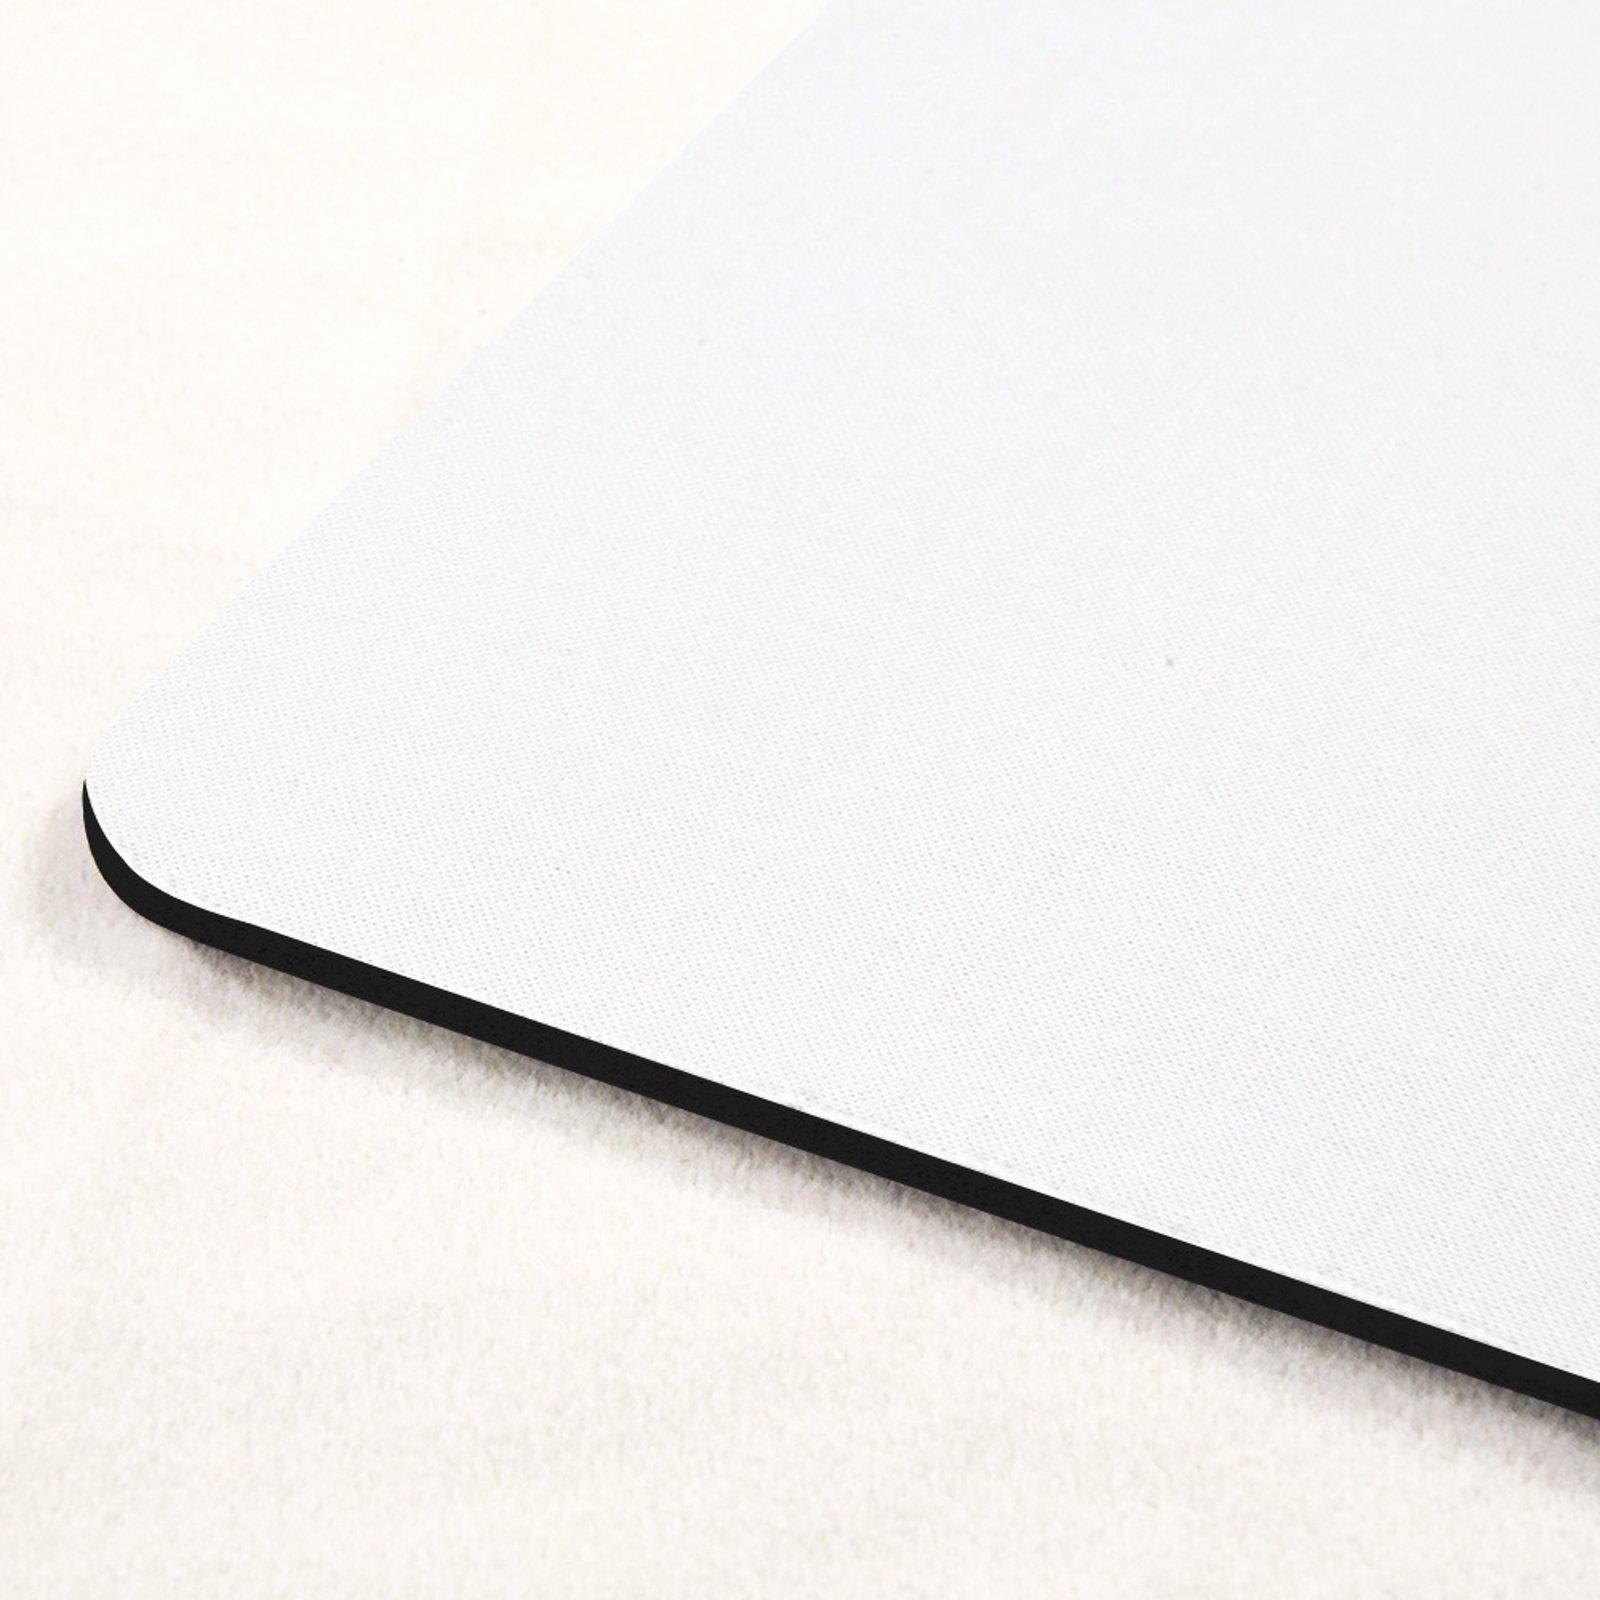 Hecede76d3a414395a8e2ffccf0abacf5n - Anime Mousepads